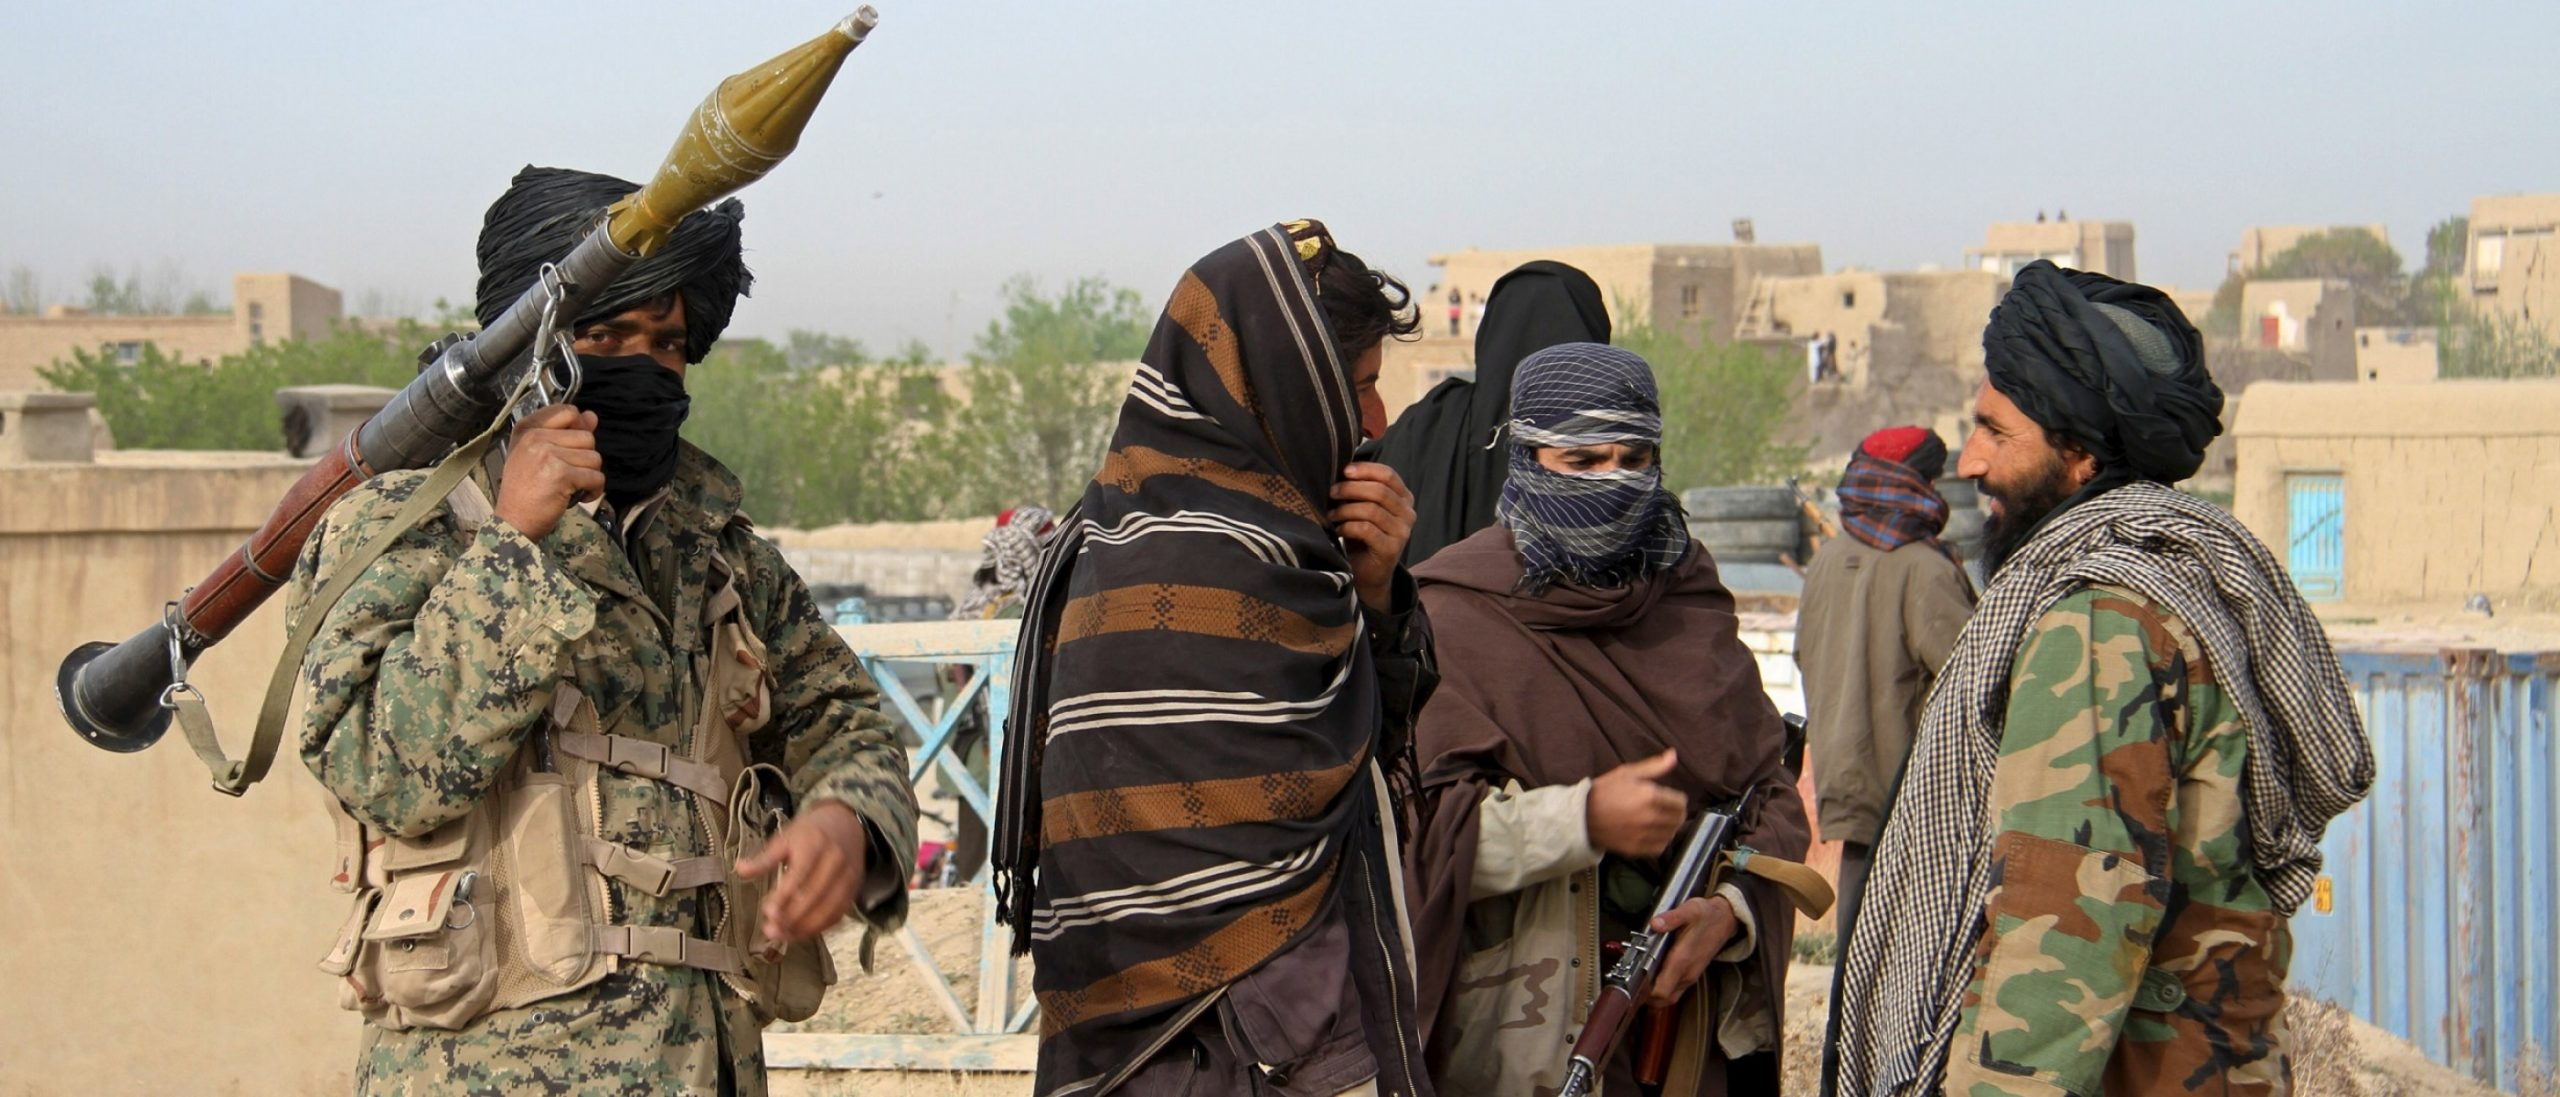 https://www.zerottounonews.it/wp-content/uploads/2020/07/talebani-scaled.jpg